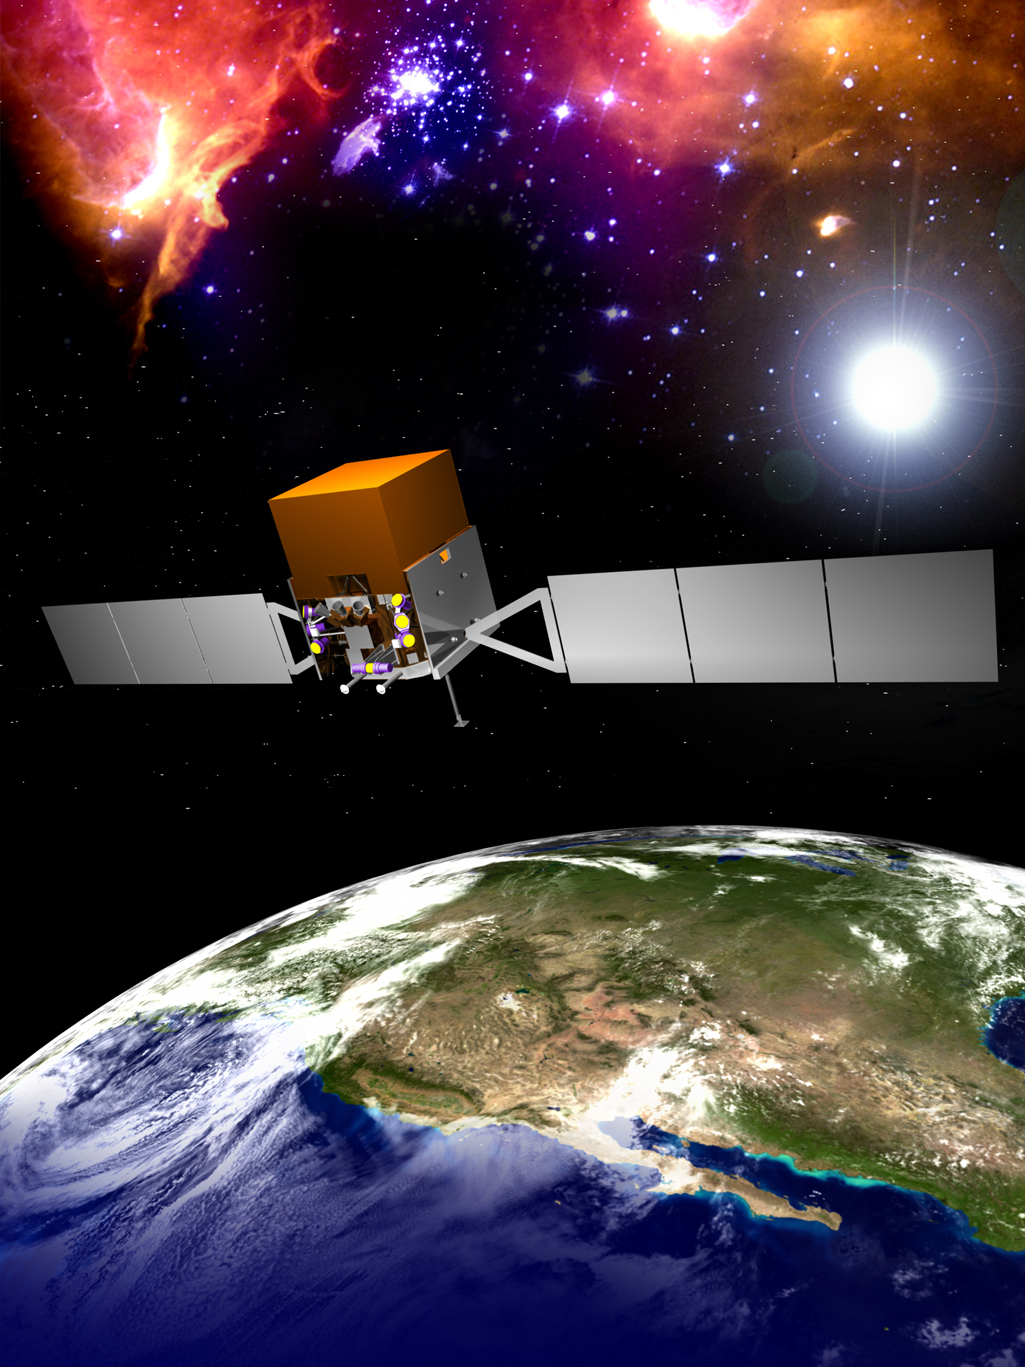 spacecraft uses - photo #9